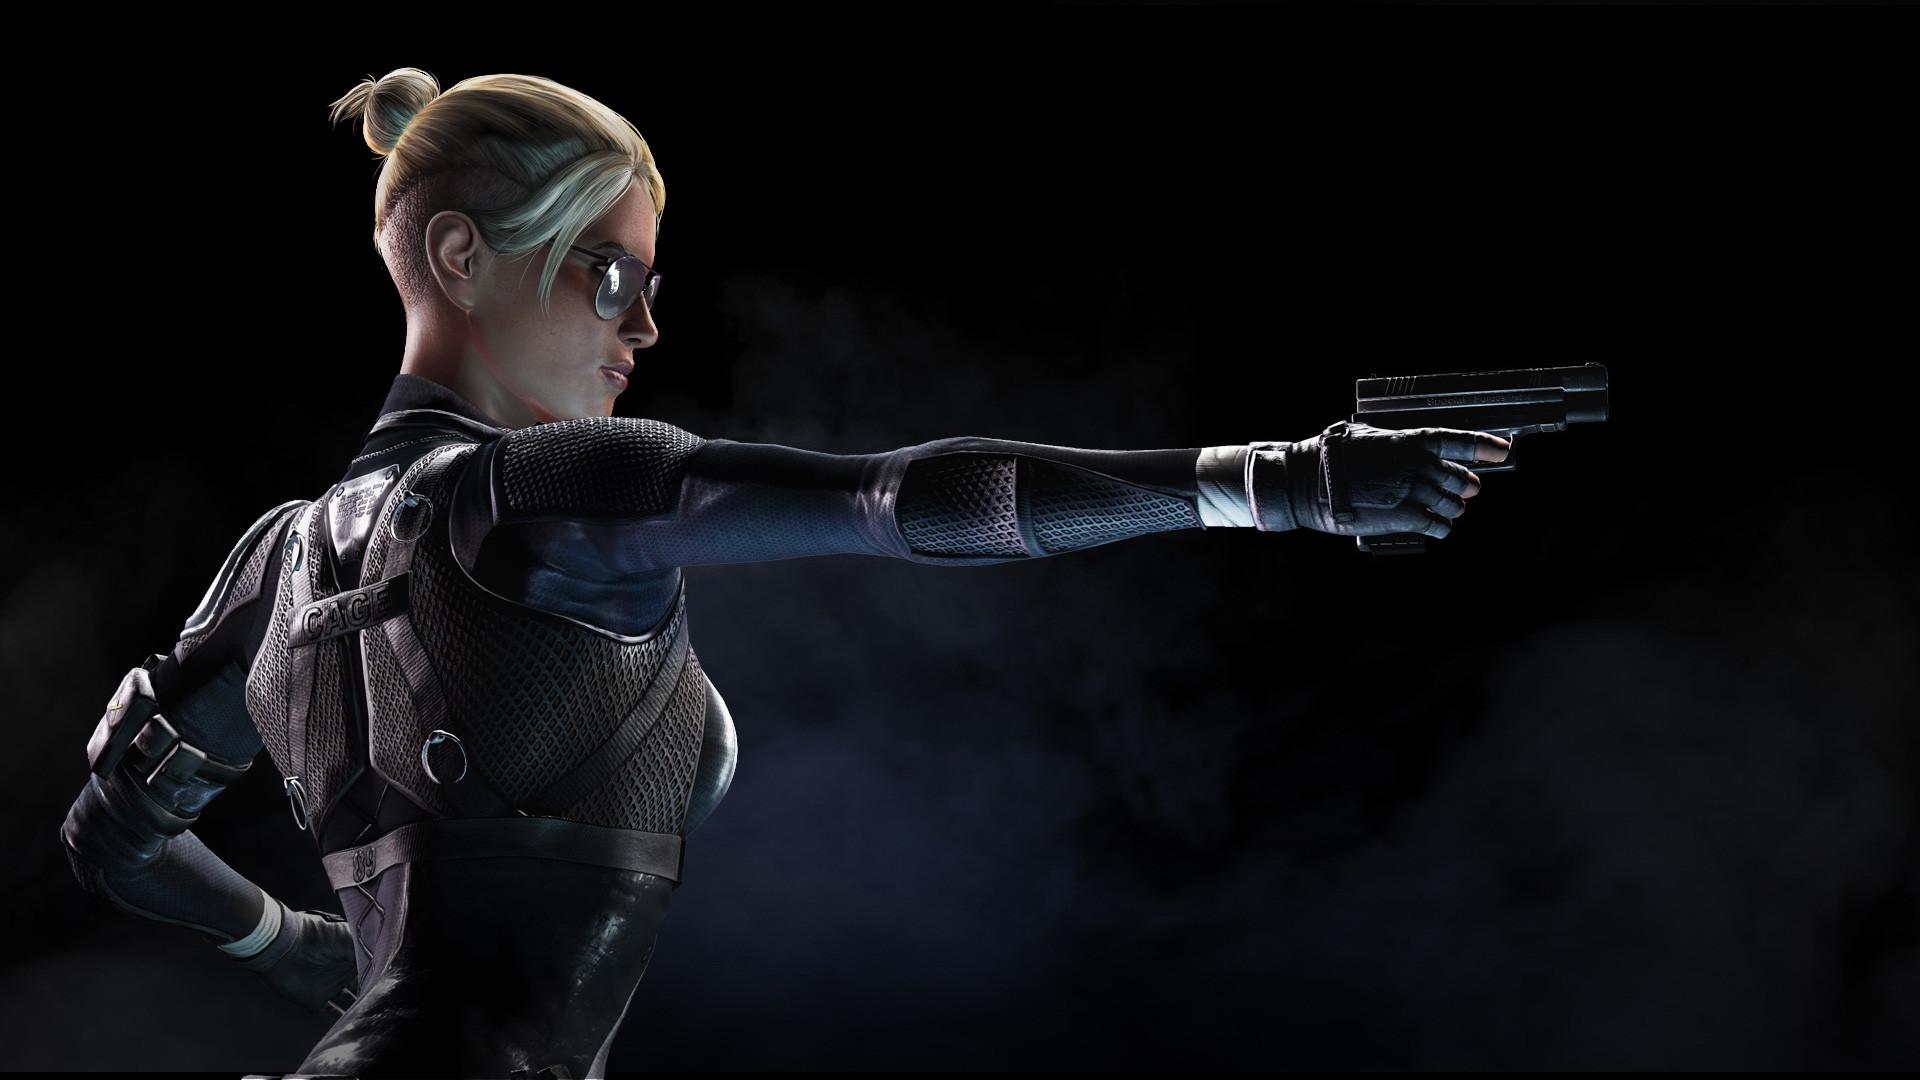 Cassie Cage Mortal Kombat X